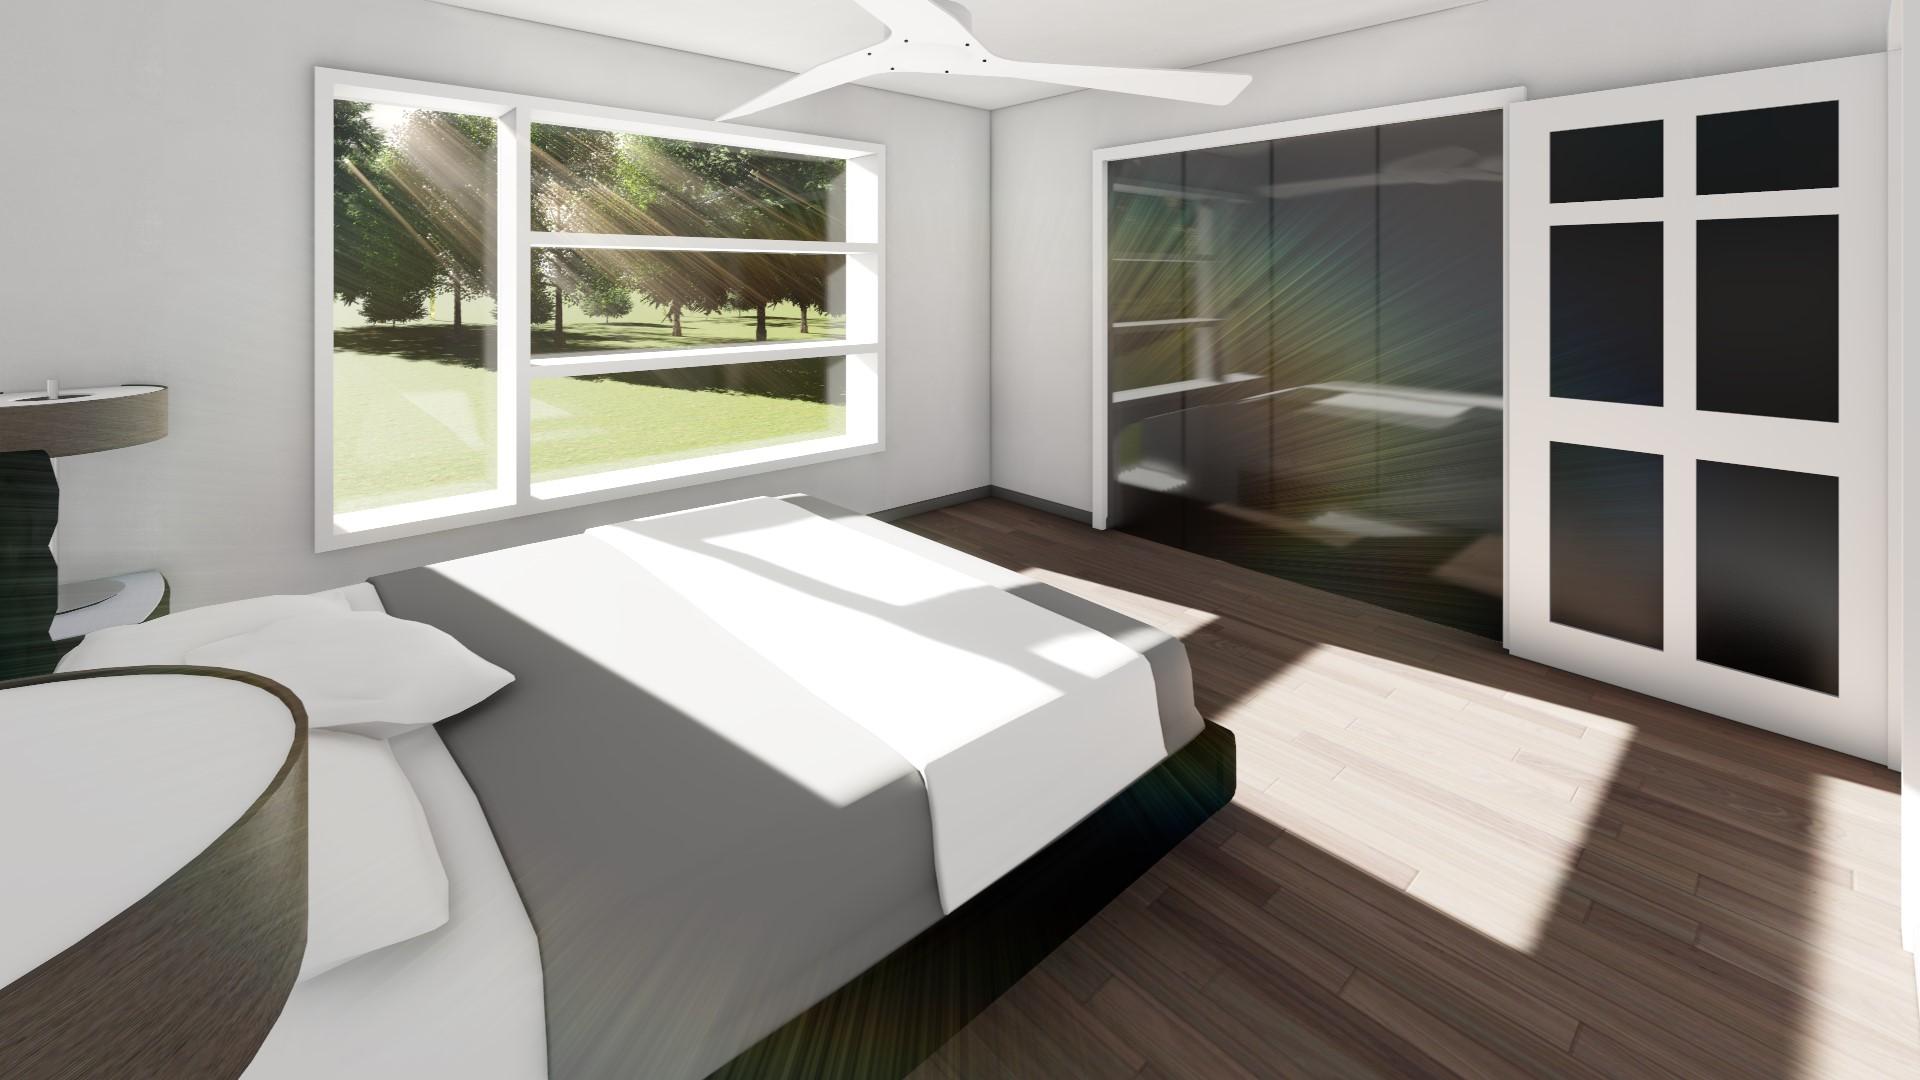 Projet - 0049 - Chambre